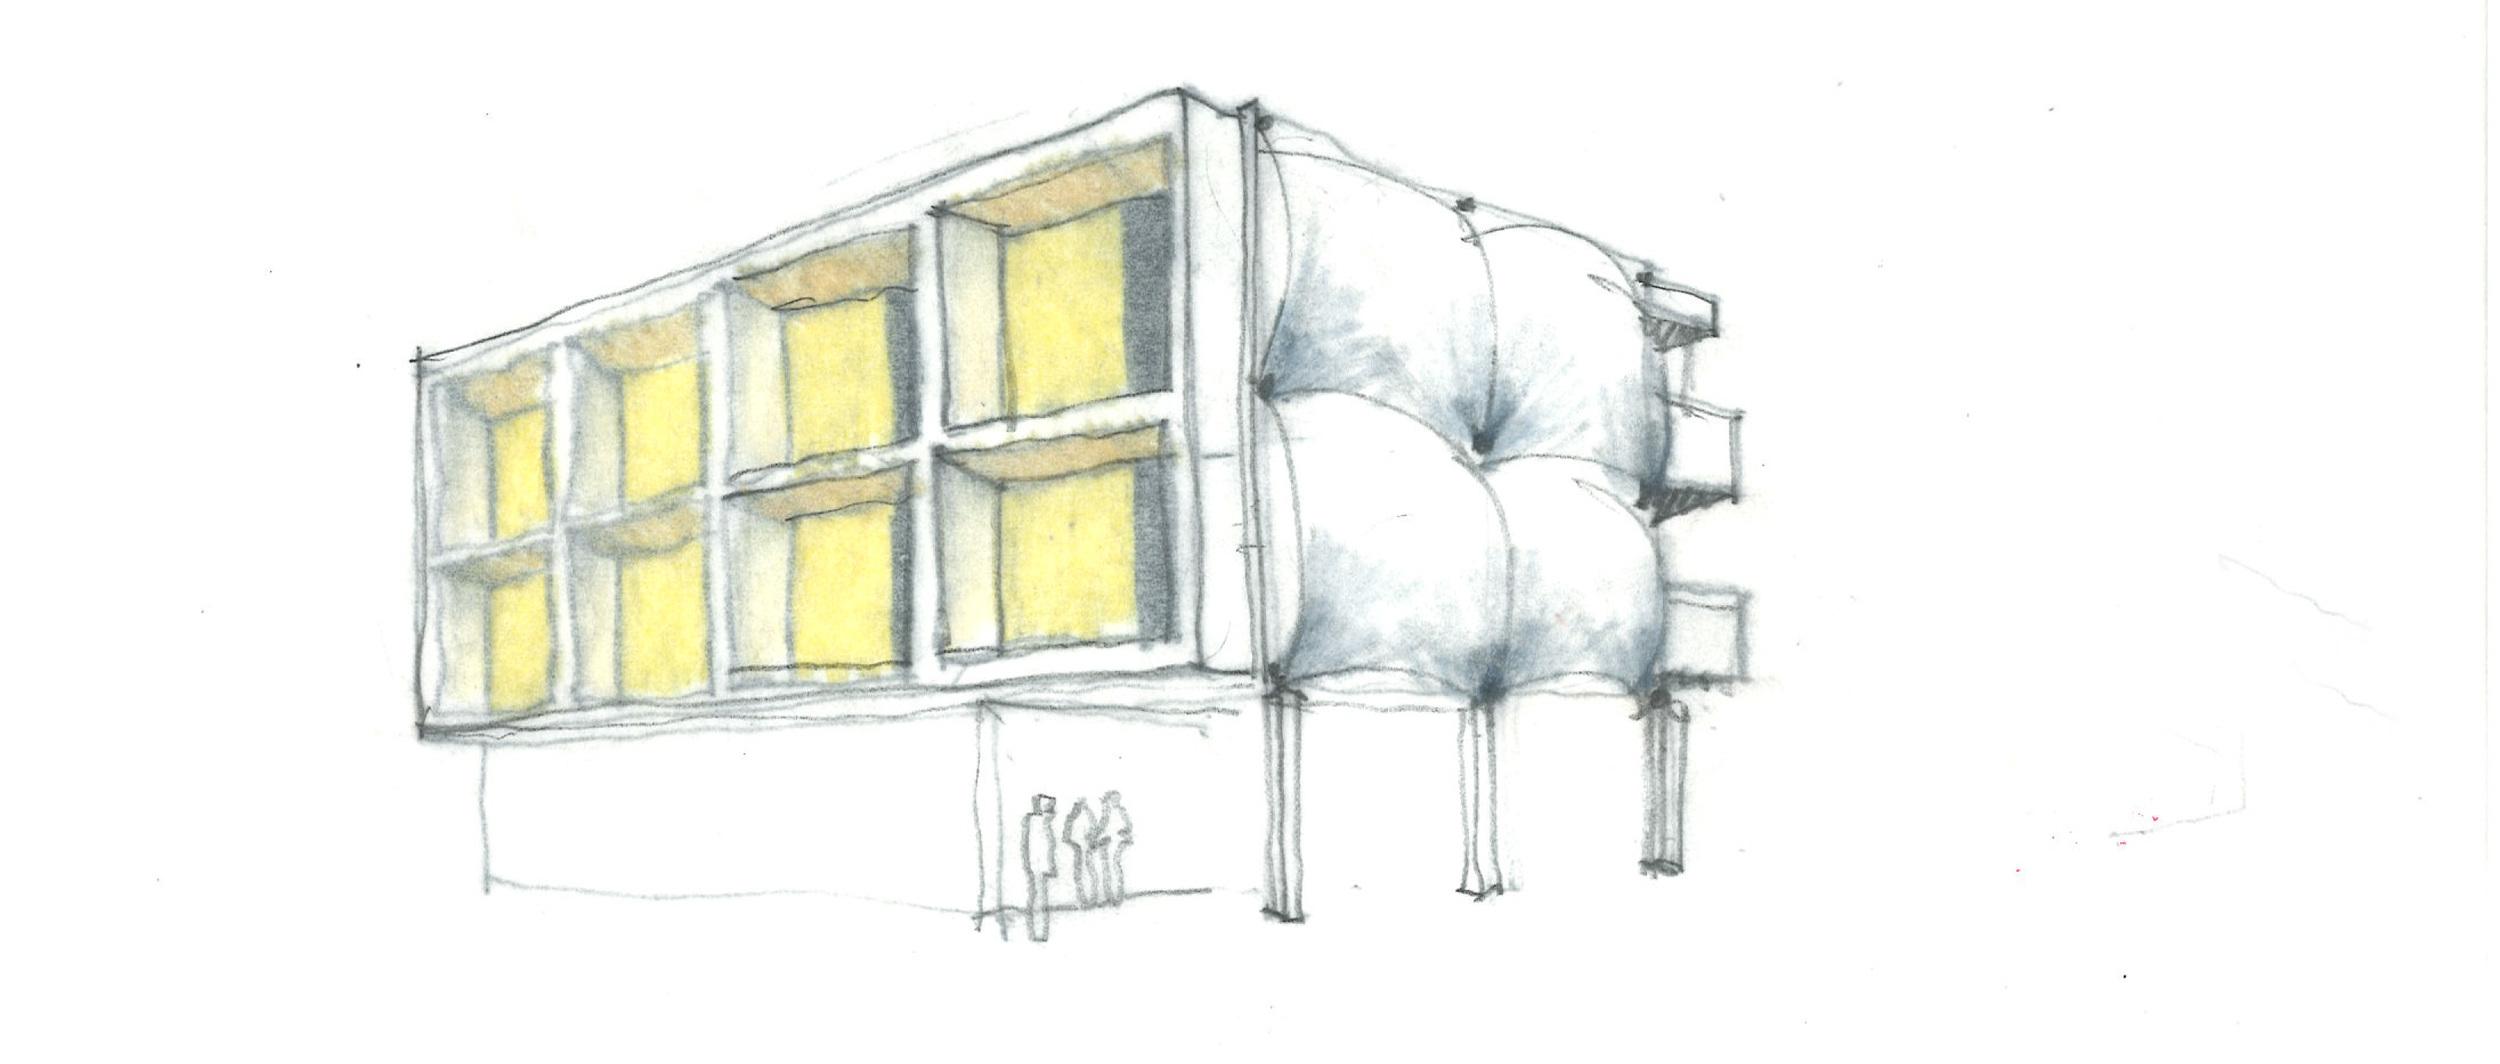 Sparano Mooney Architecture_Central 9_Process_Sketch_Facade_EggShell_01.jpg